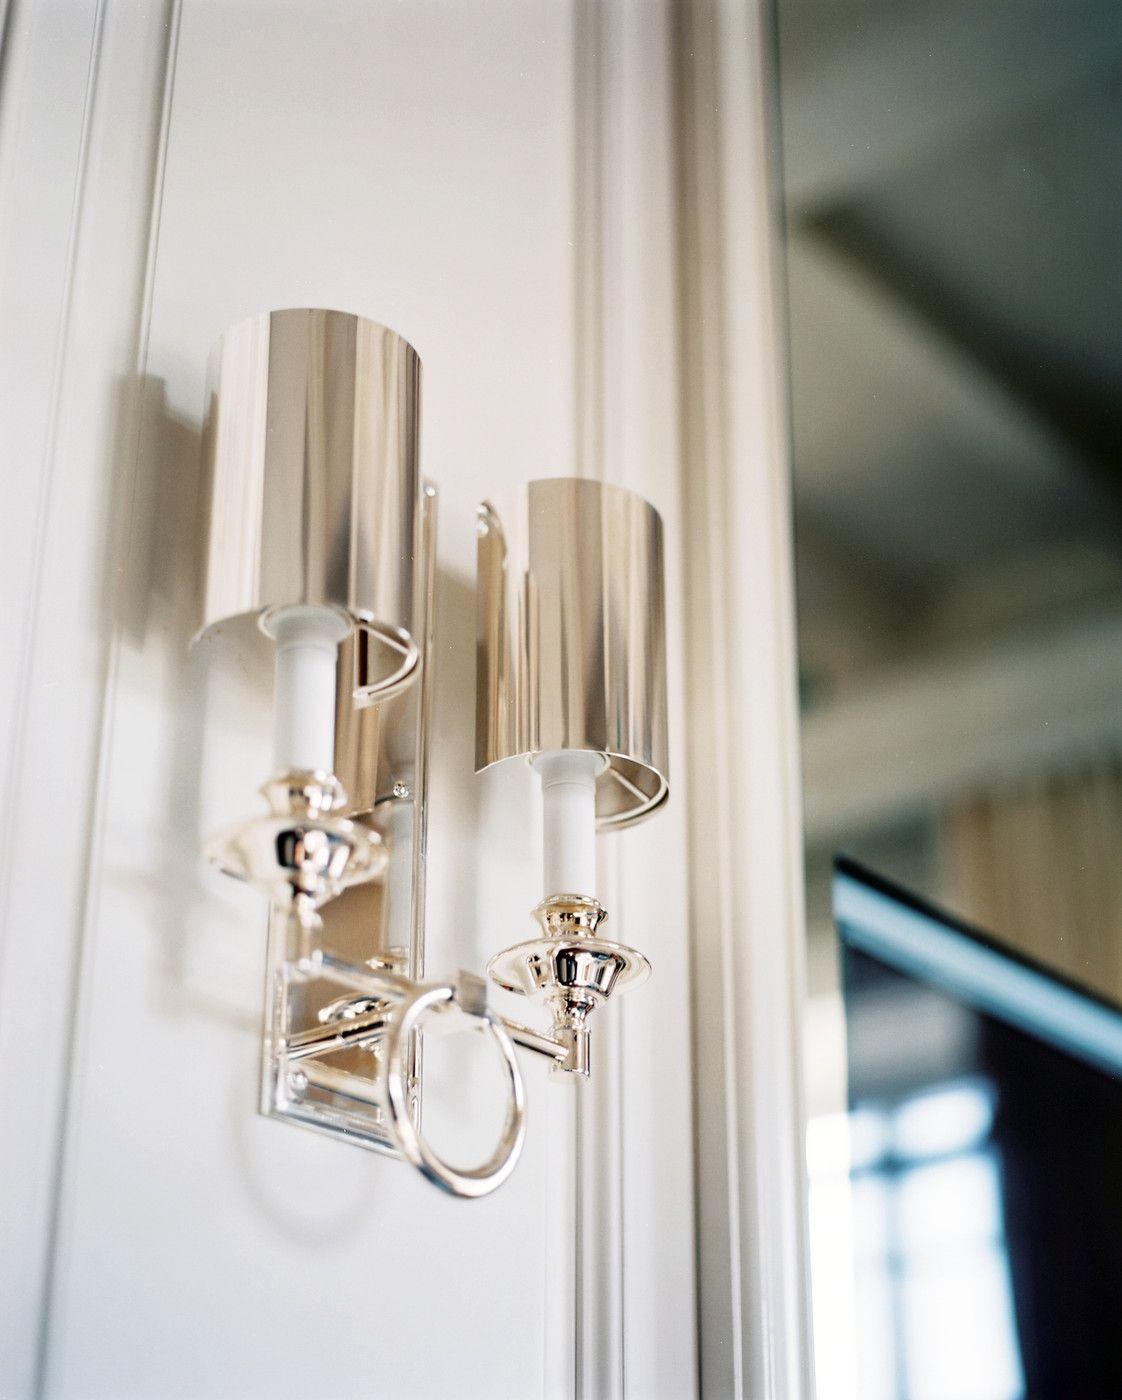 Michele bonan detalles pinterest lights